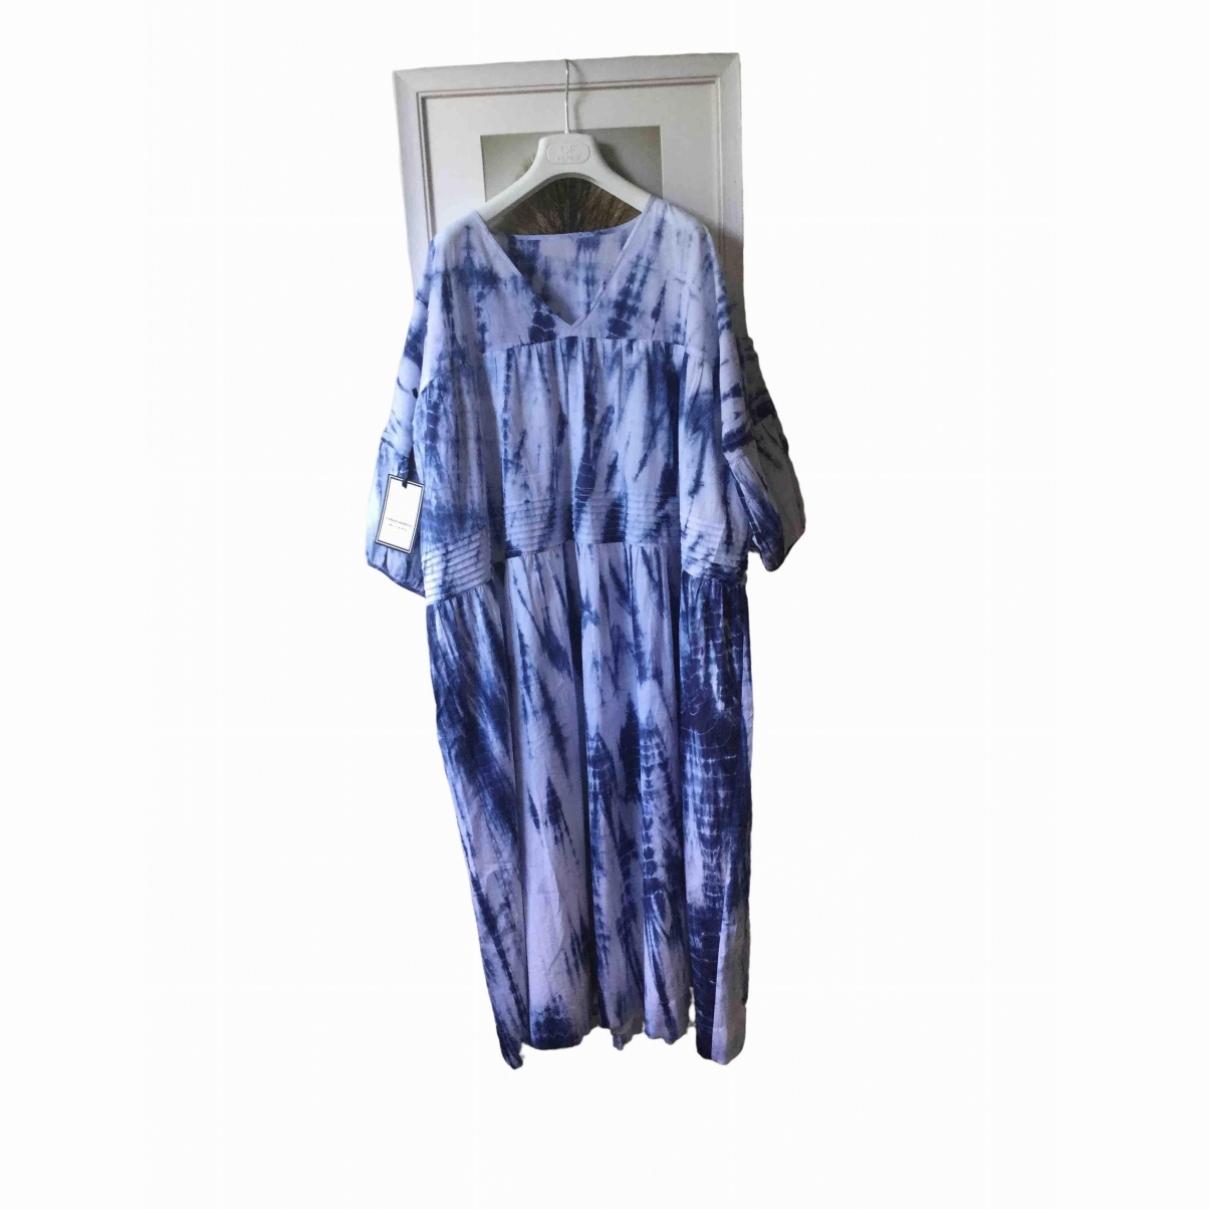 Non Signé / Unsigned Manche ballon Blue Cotton dress for Women One Size International